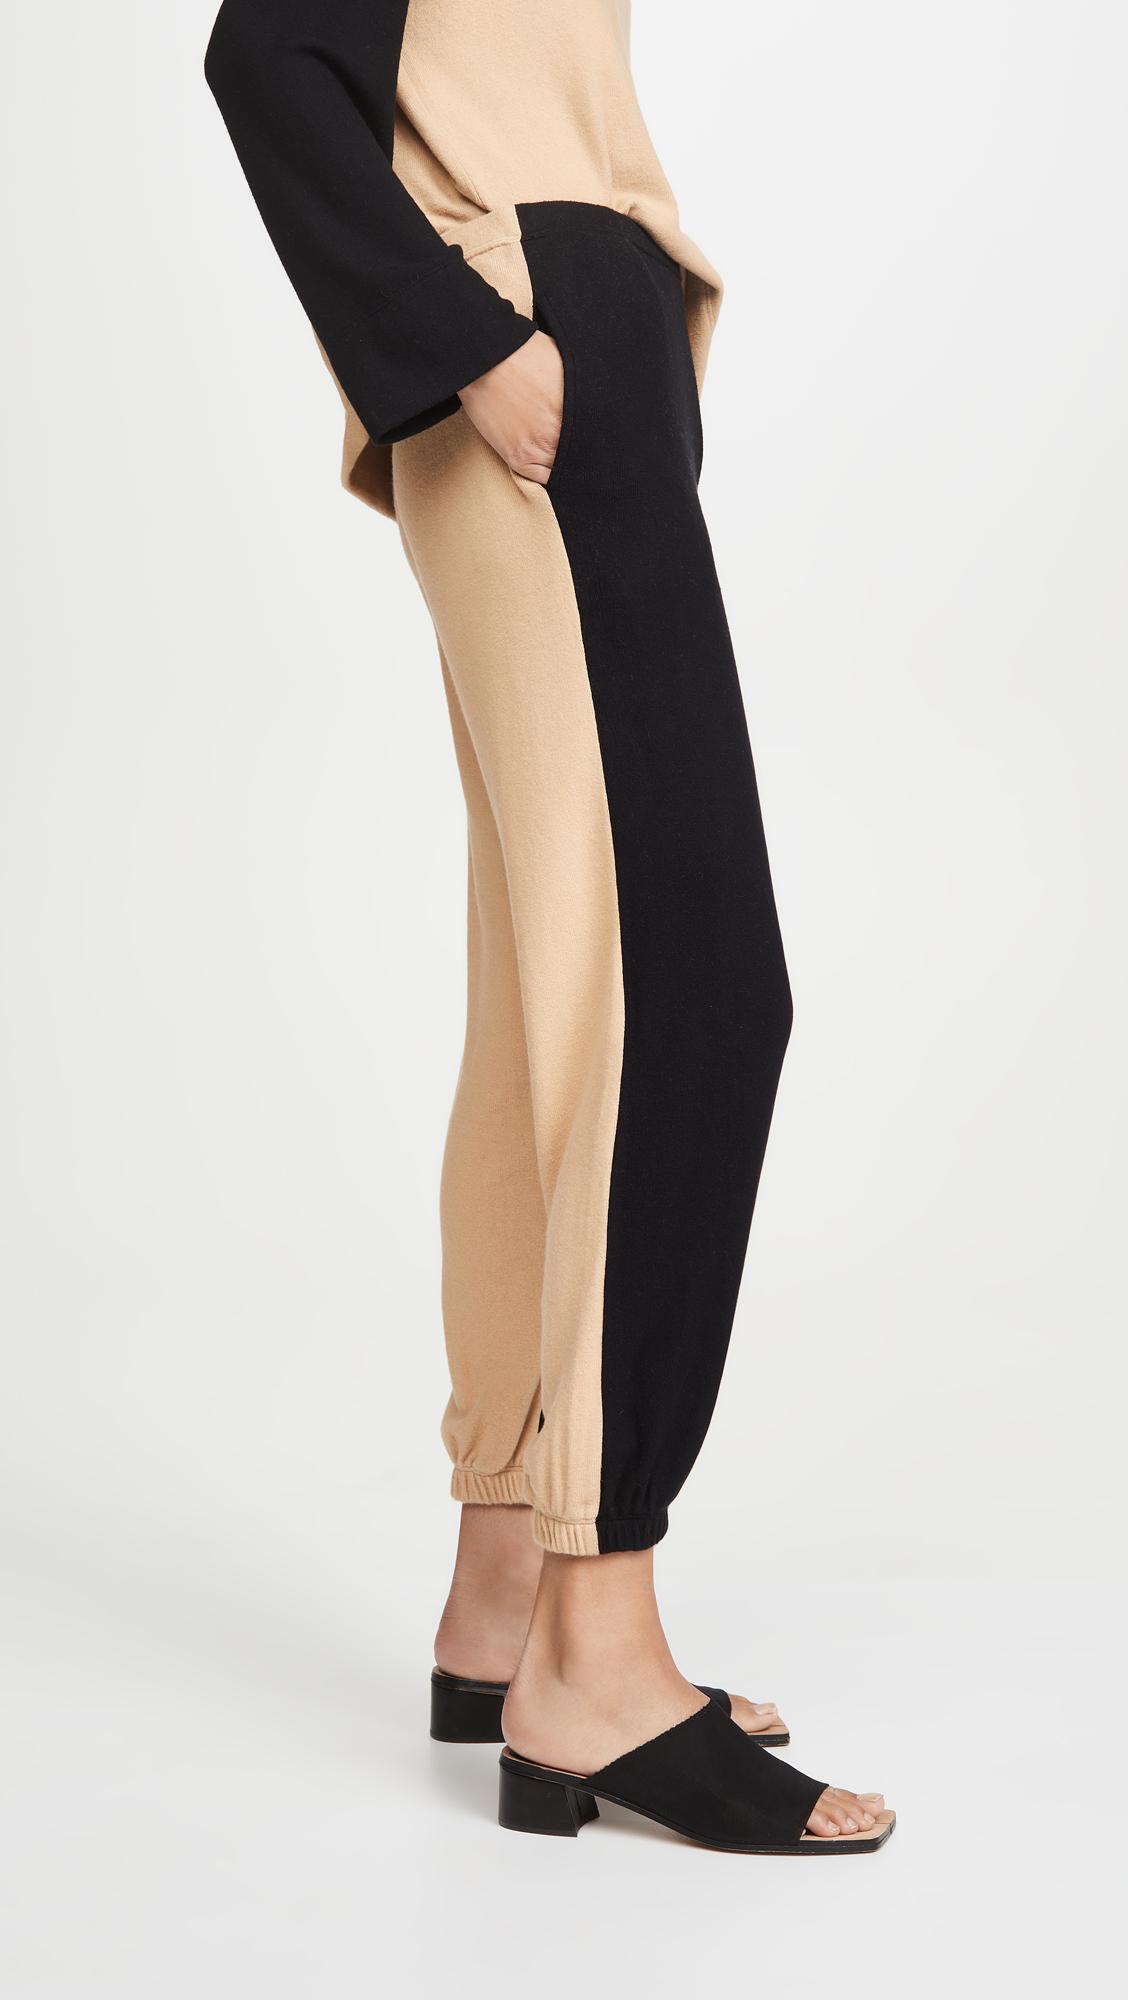 Nina Dobrev's Tie-Dye Matching Set Is Absolutely My Next Purchase 26